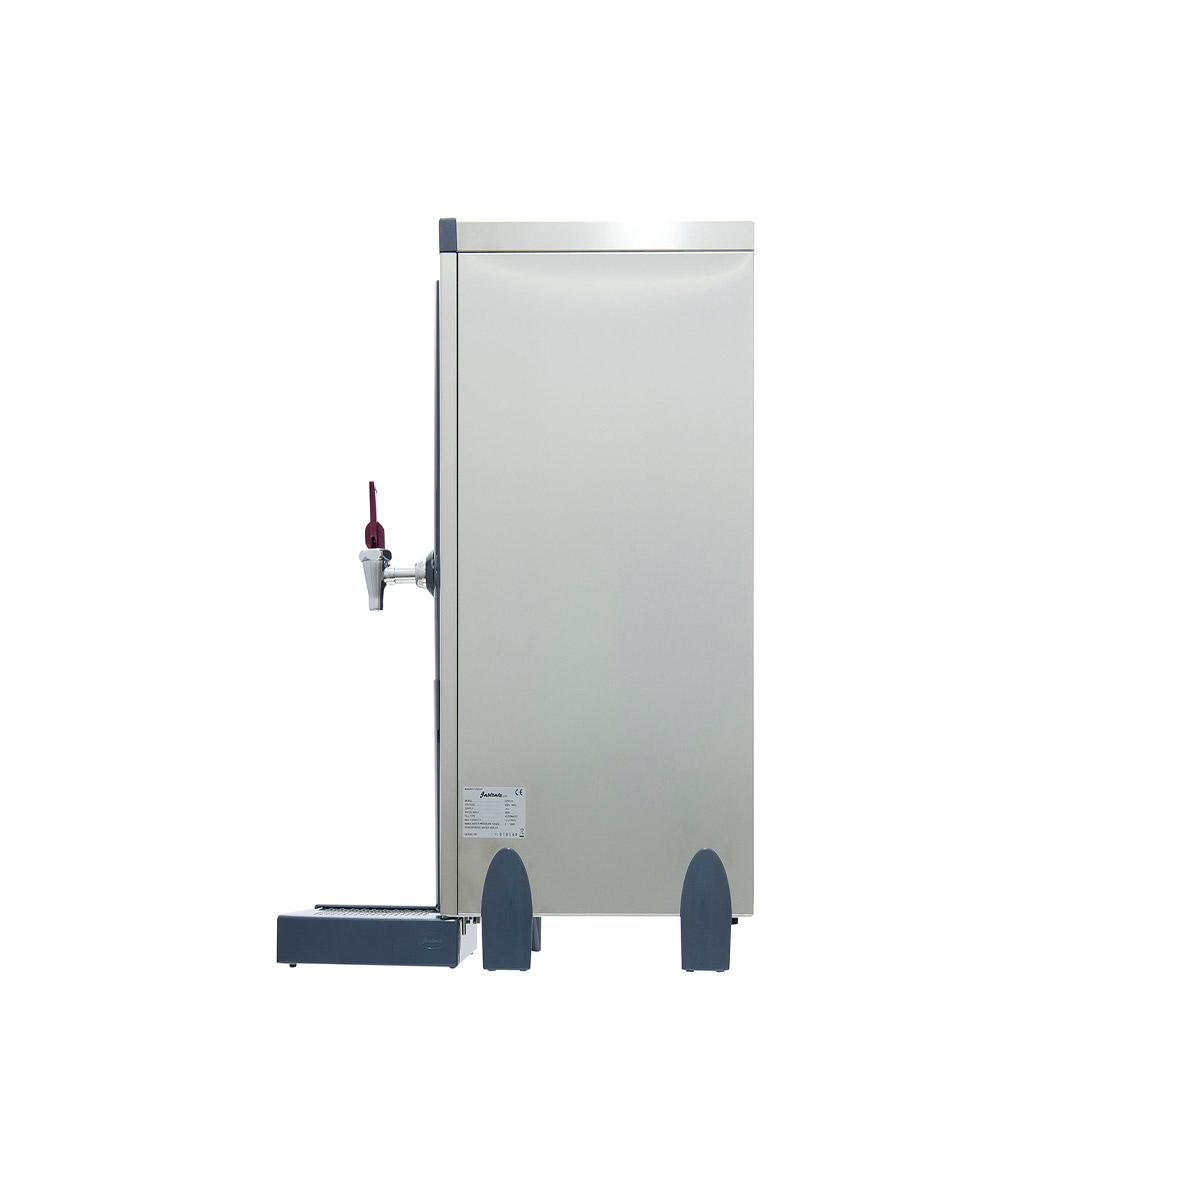 Instanta Sureflow Plus Counter Top Water Boiler CTSP11H/4 High Tap Filtered 11Ltr